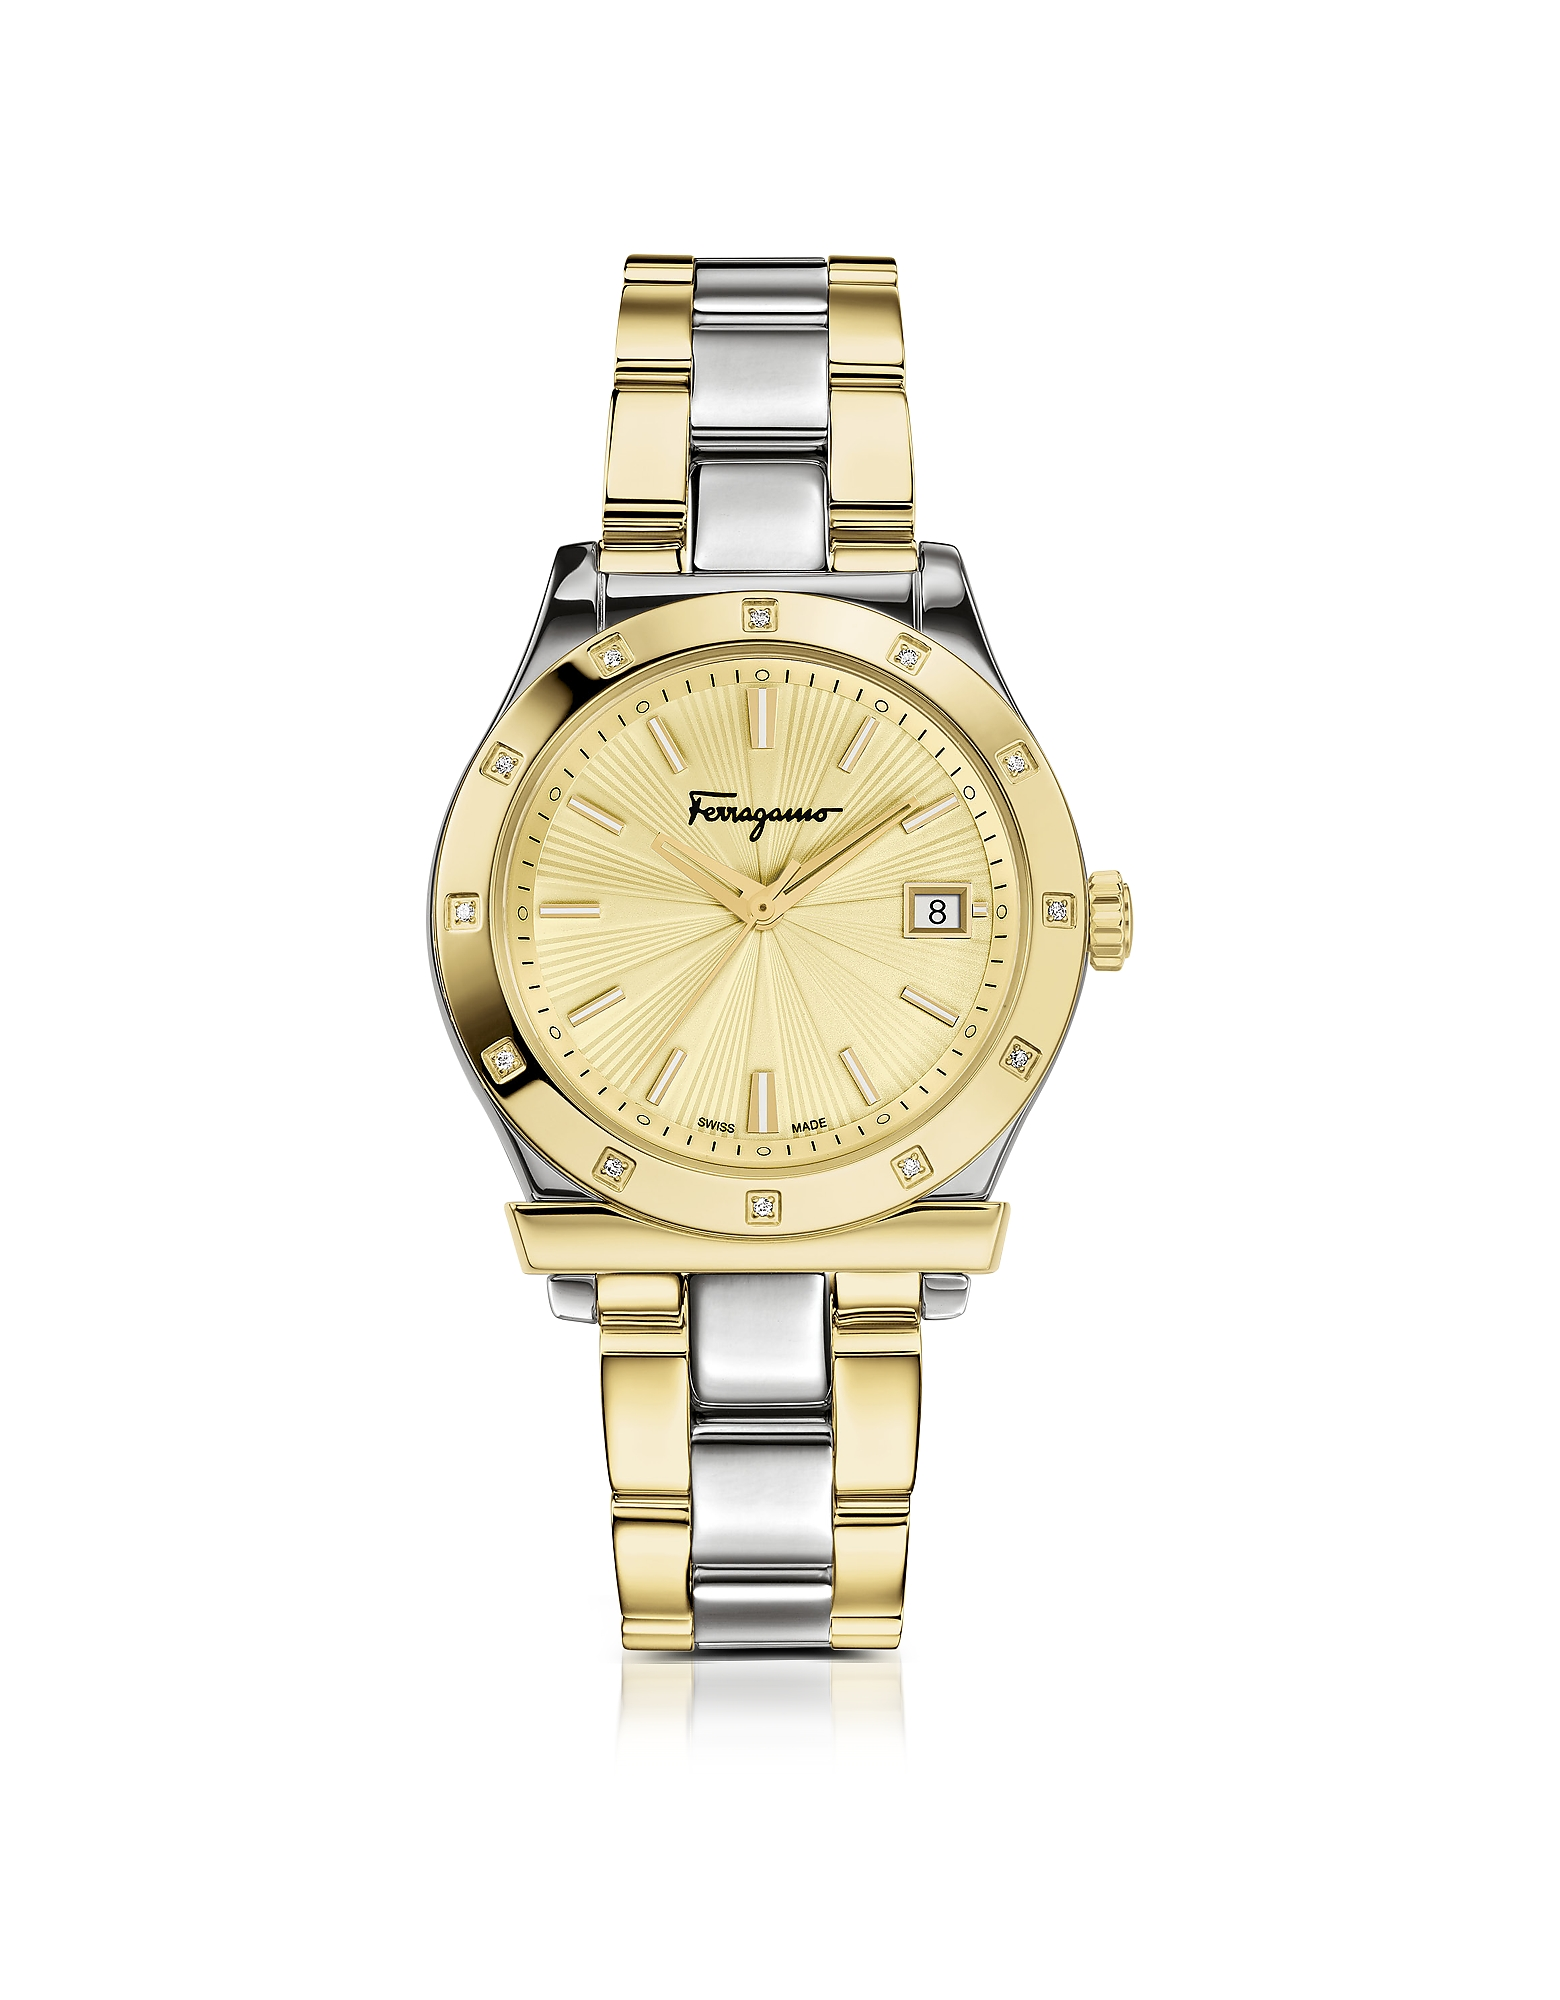 Ferragamo 1898 Stainless Steel and Gold IP Women's Bracelet Watch w/Diamonds